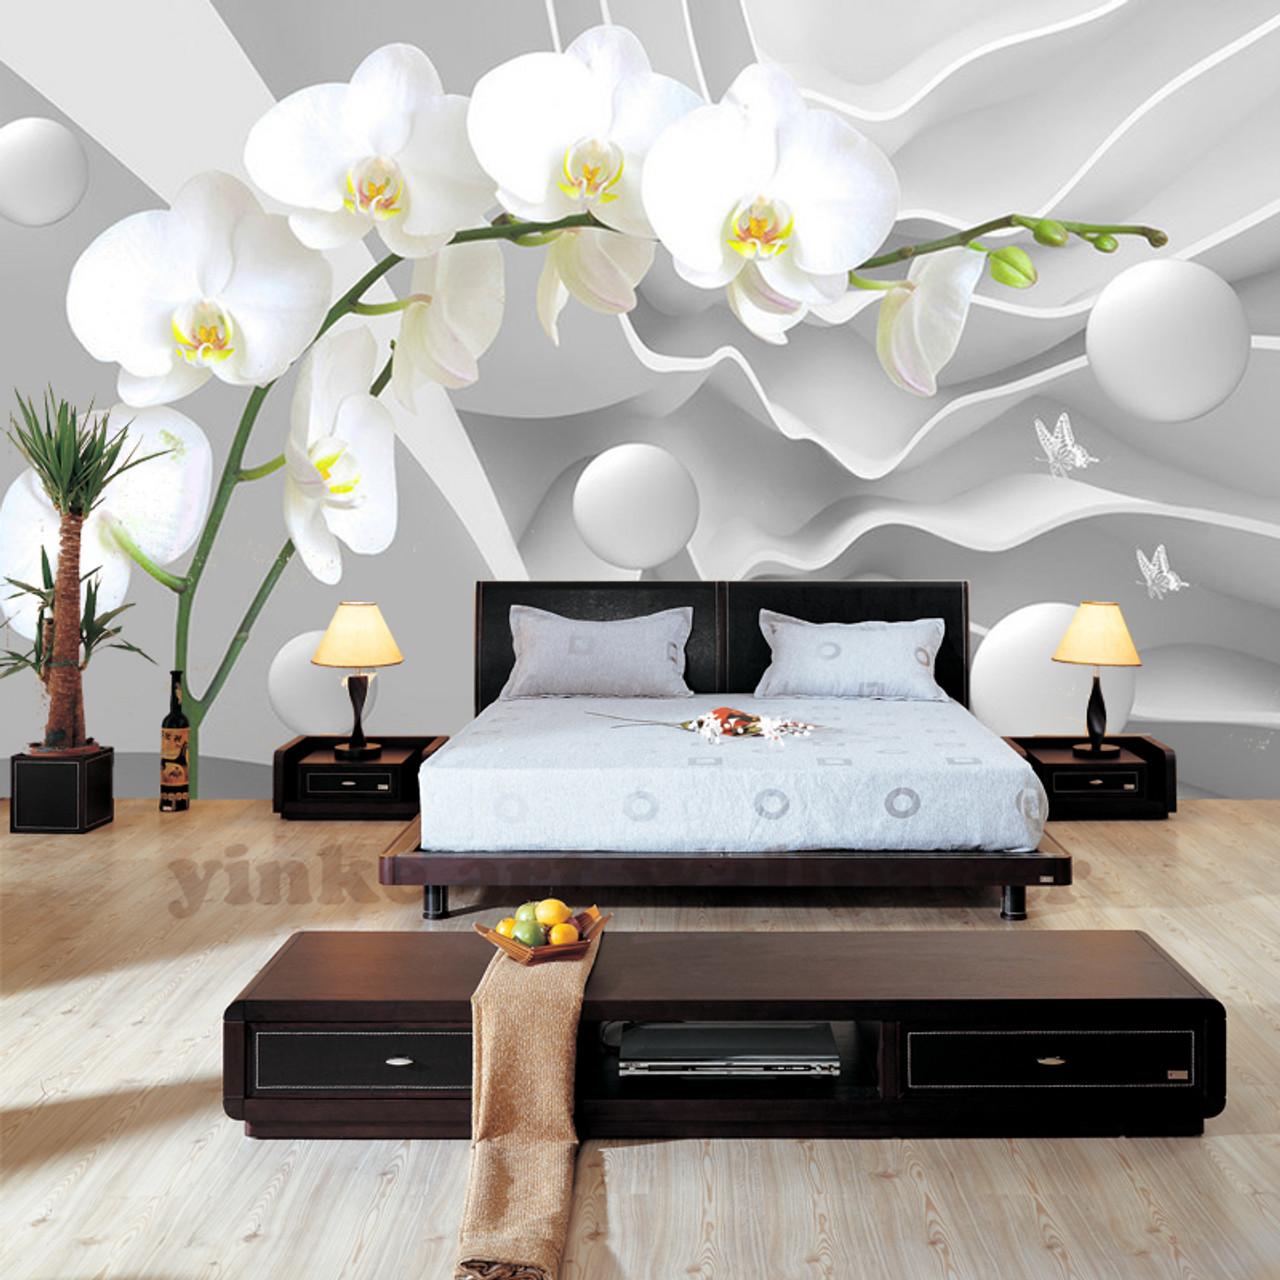 Custom 3d Stereoscopic Wallpaper Space Butterfly Orchid Ball Wallpaper Modern Living Room Bedroom 3d Wallpapers Large Mural Onshopdeals Com